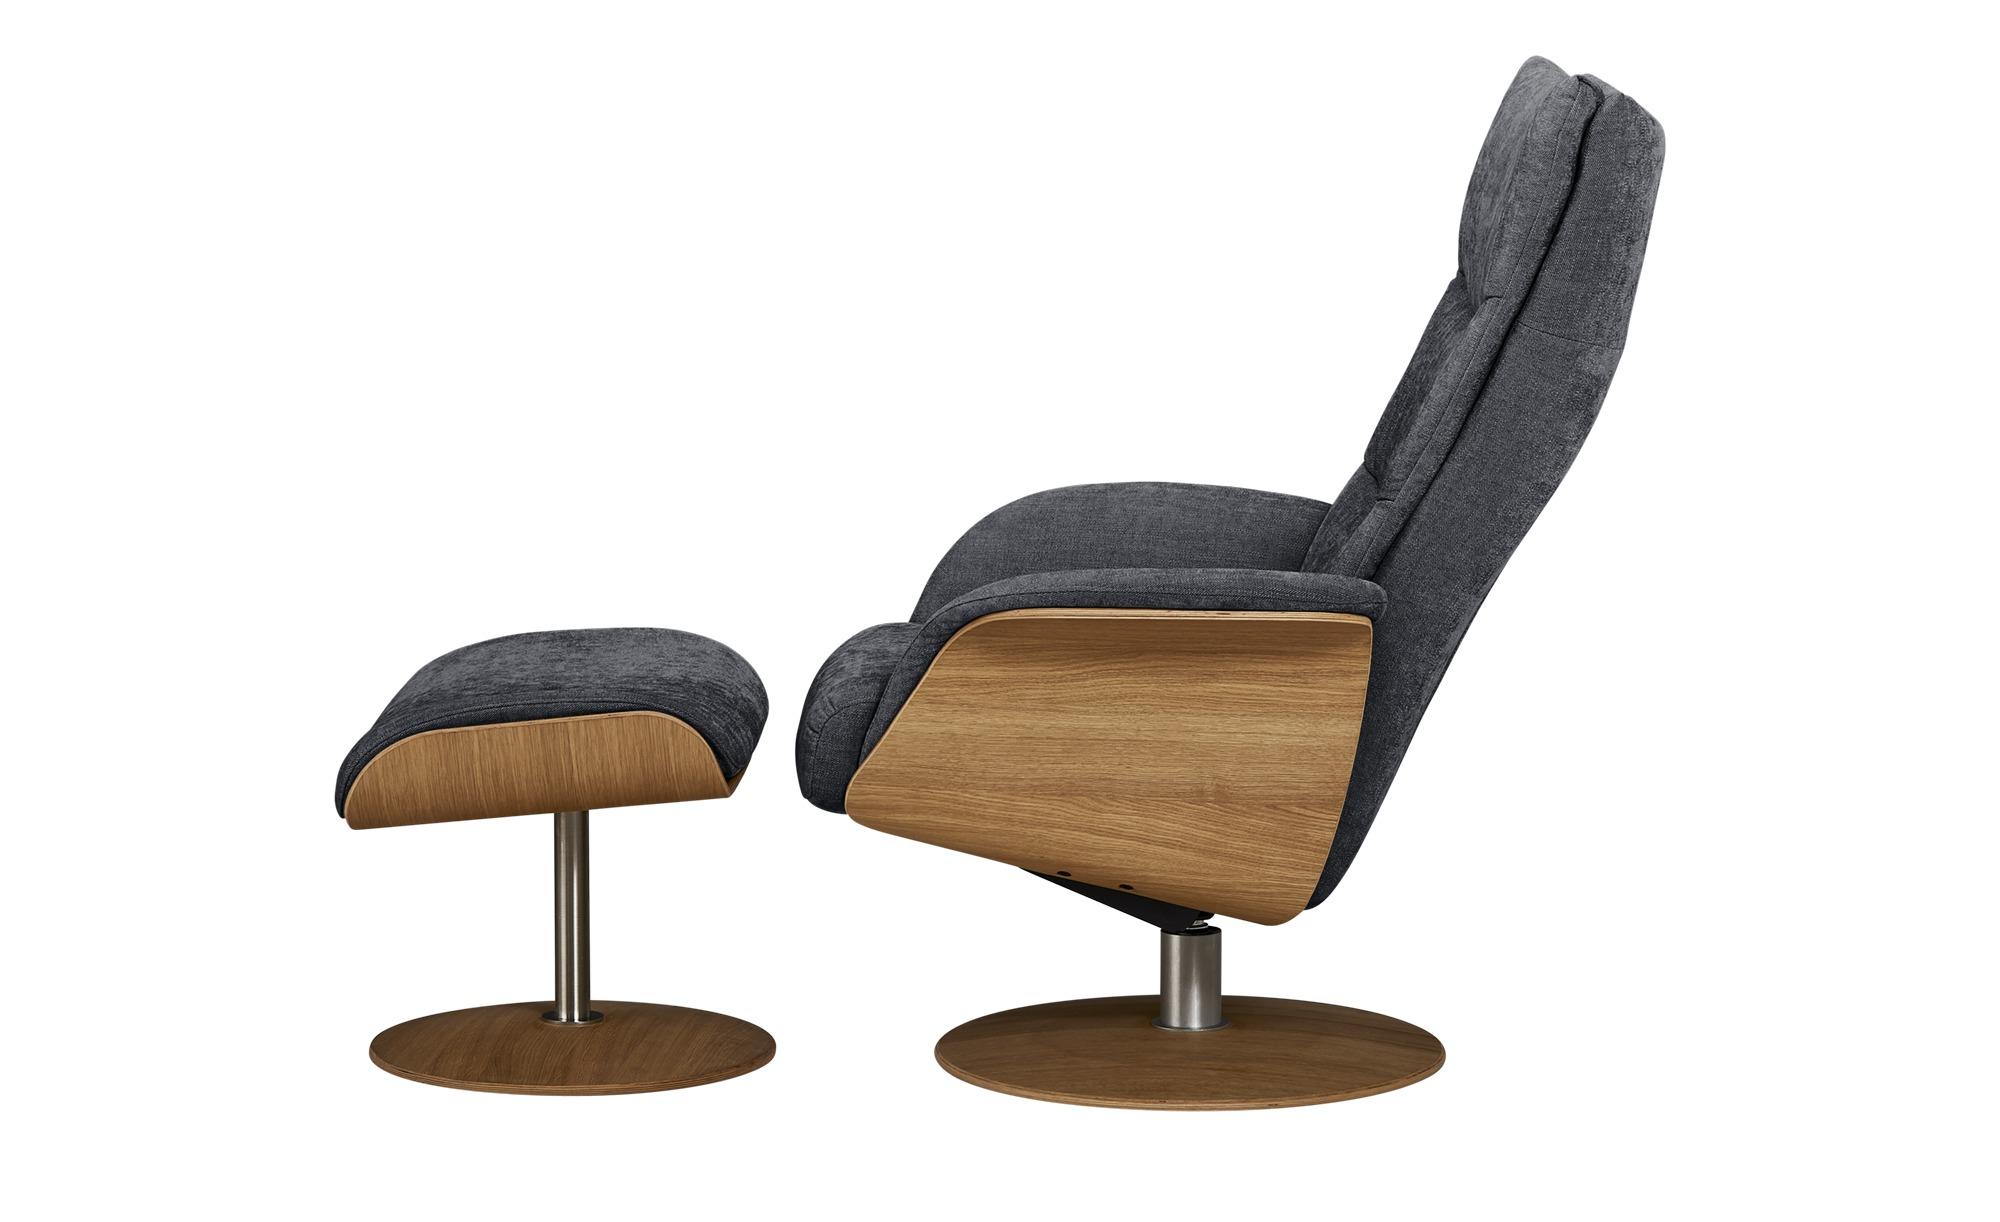 Relaxsessel  Stian ¦ grau ¦ Maße (cm): B: 77 H: 116 T: 82 Polstermöbel > Sessel > Fernsehsessel - Höffner